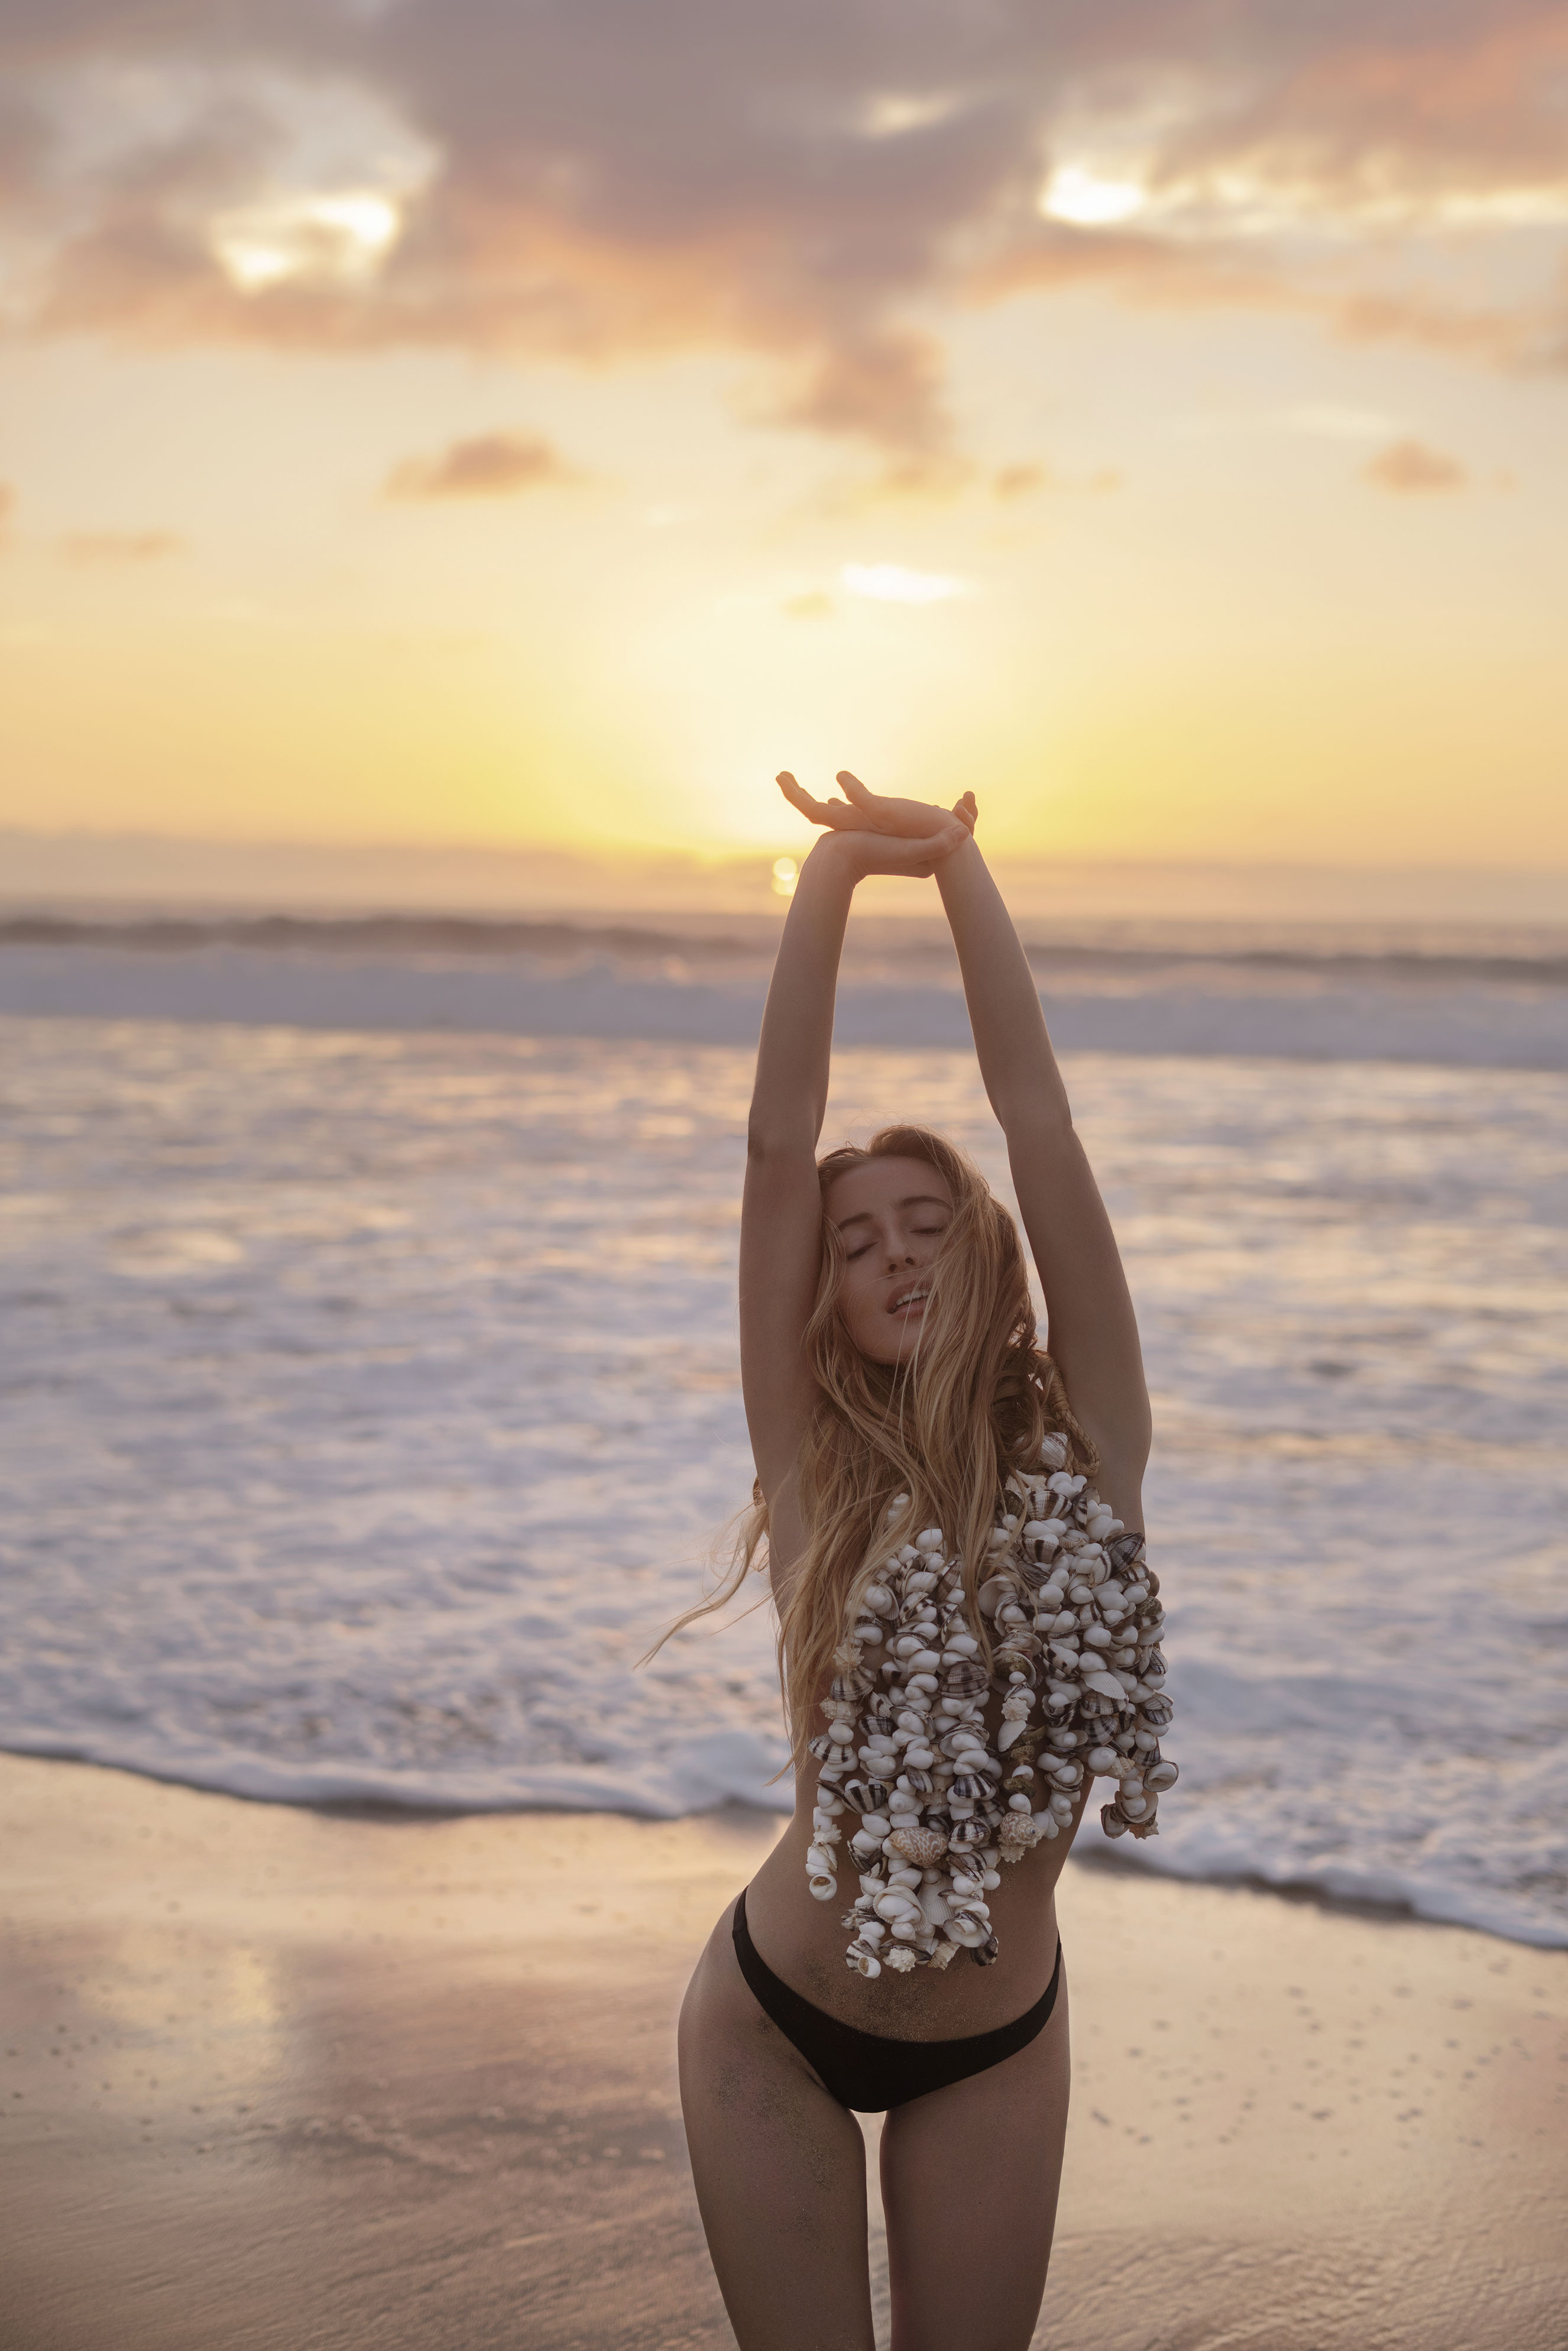 Skyler swimwear pop-up boutiques coming to punta mita, surf chic, vallarta lifestyles 2019